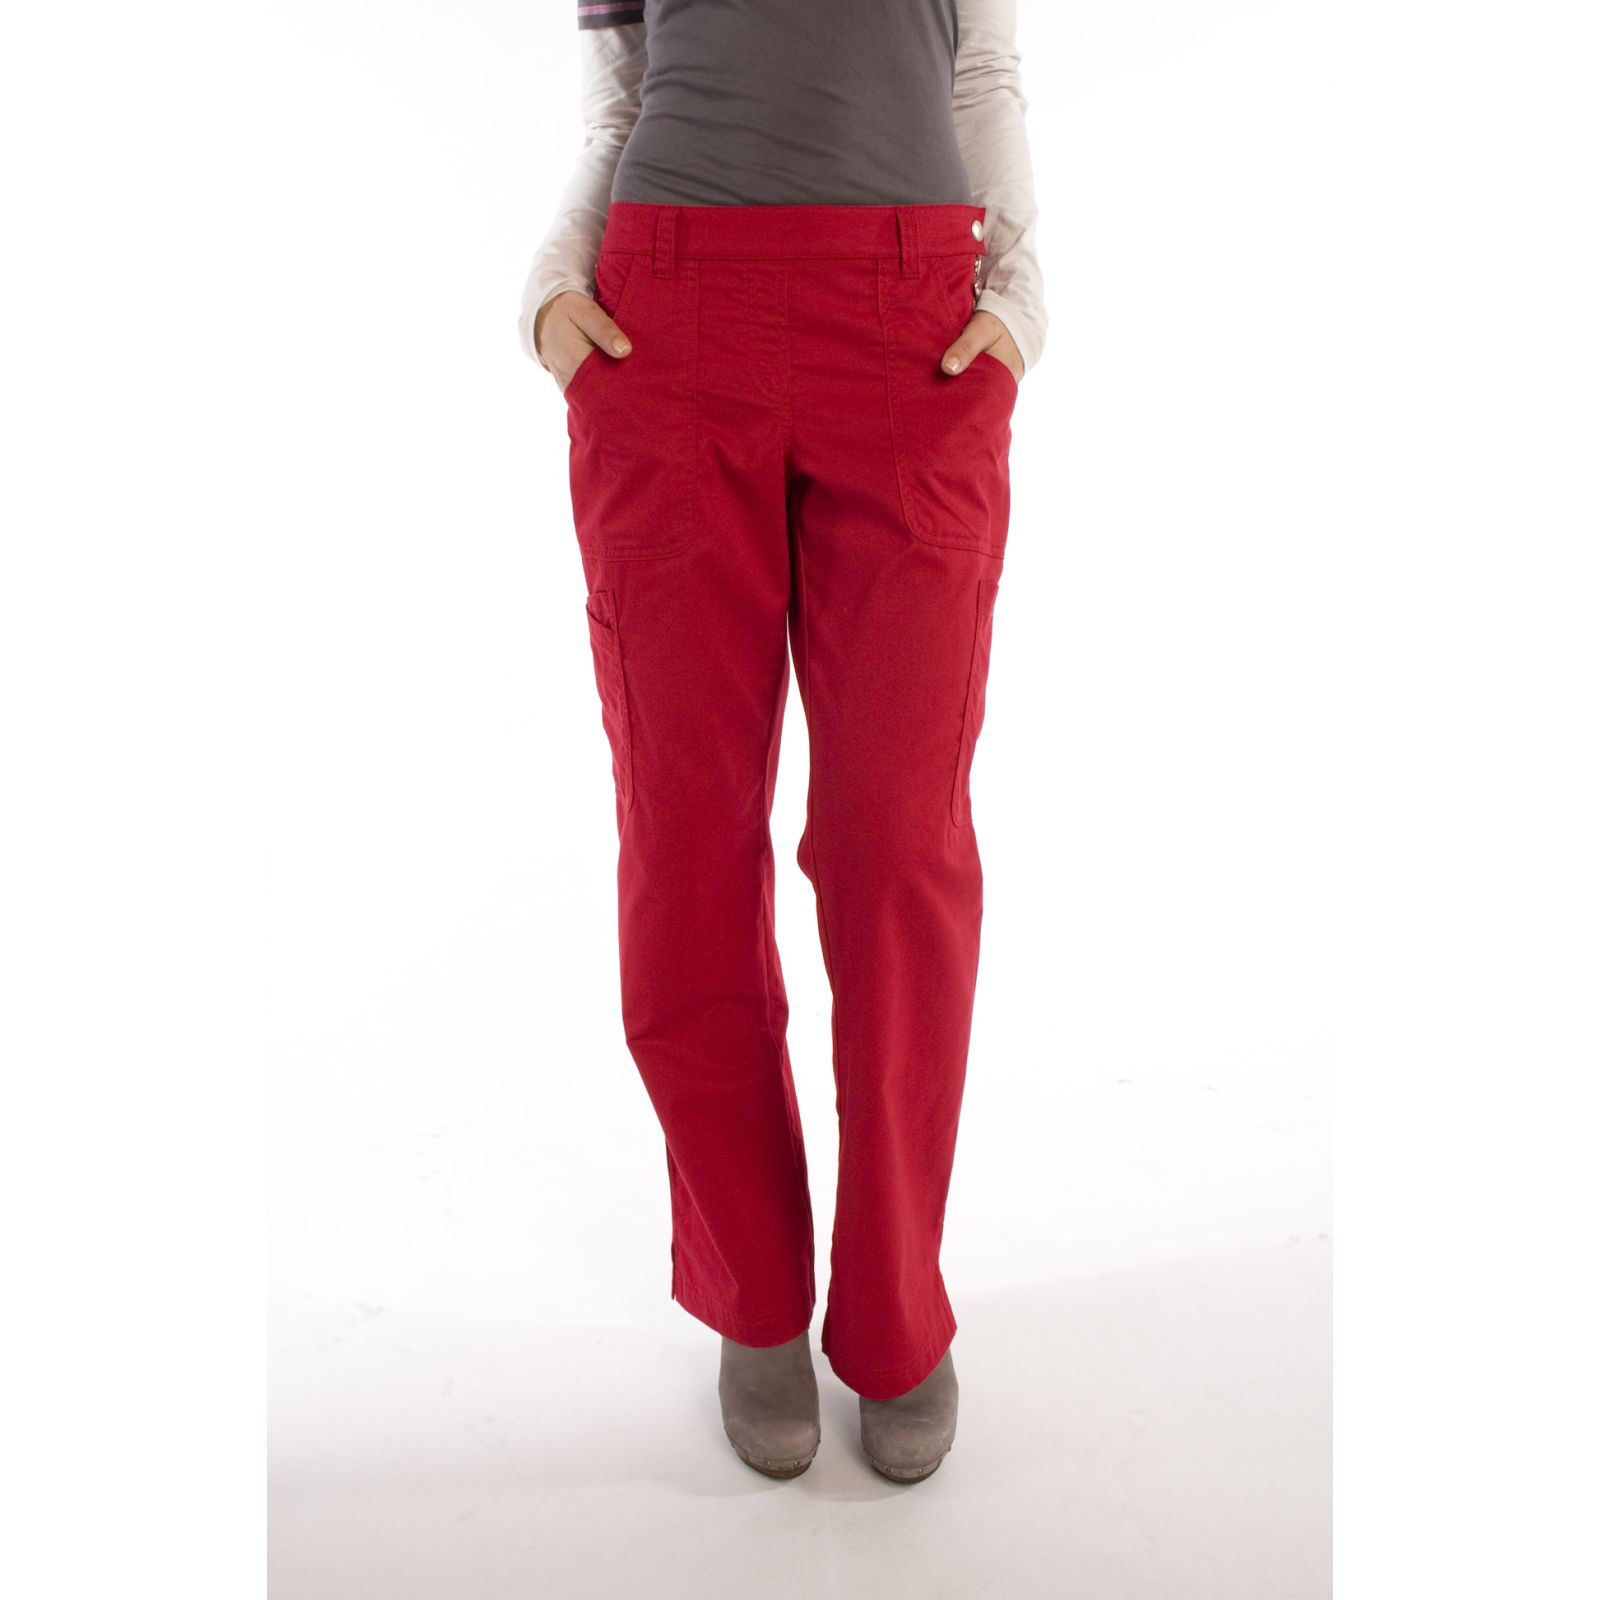 "Pantalon élastique, femme ""Katelyn"", Koi (709-) rouge face"